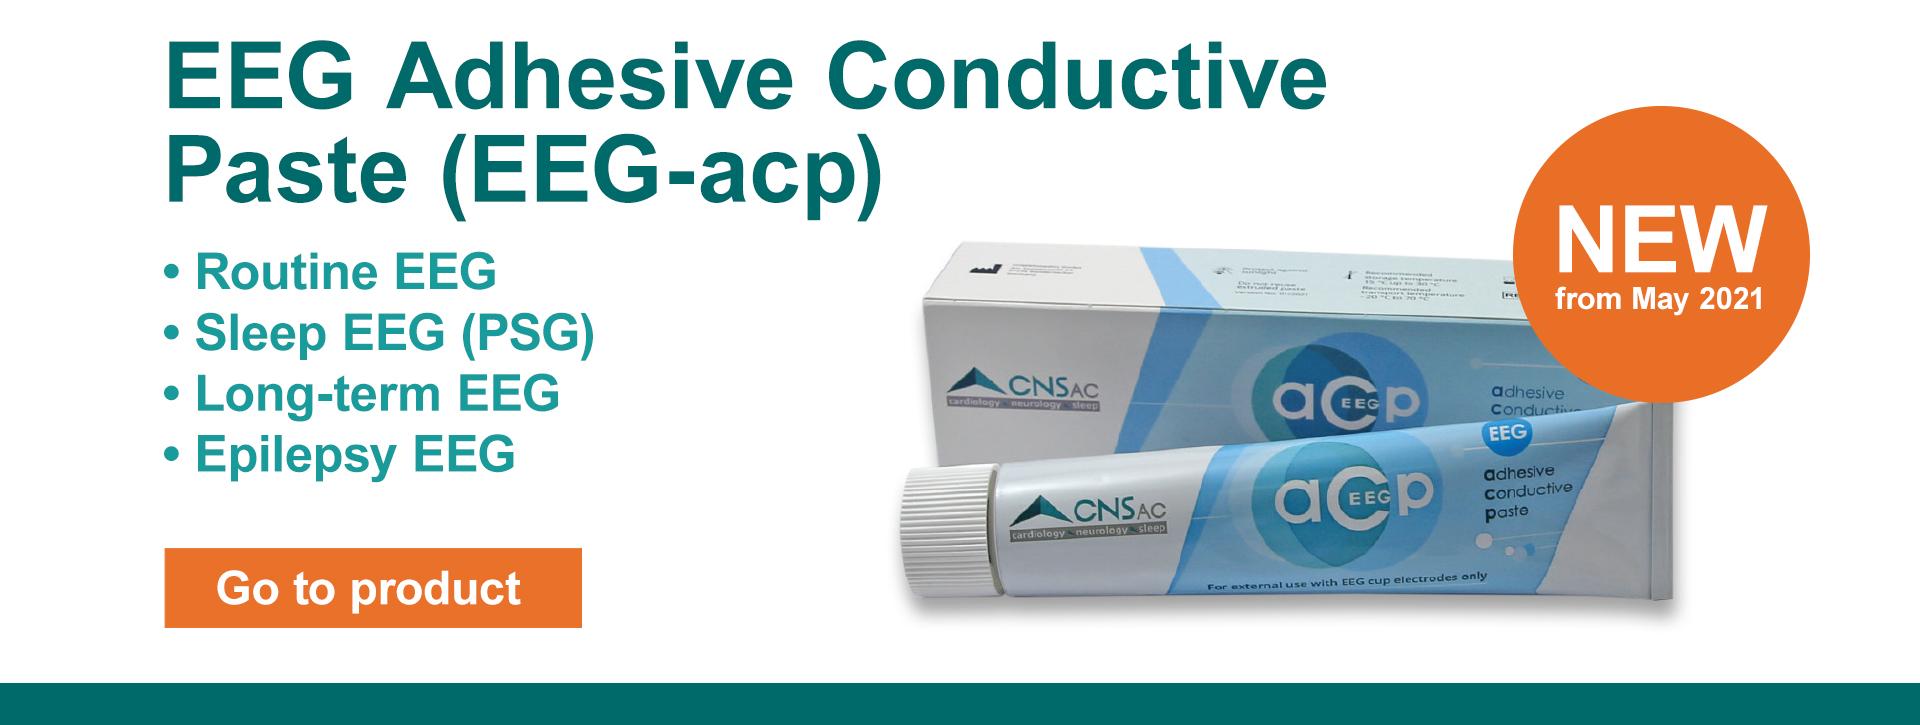 EEG-Adhesive-Conductive-Paste